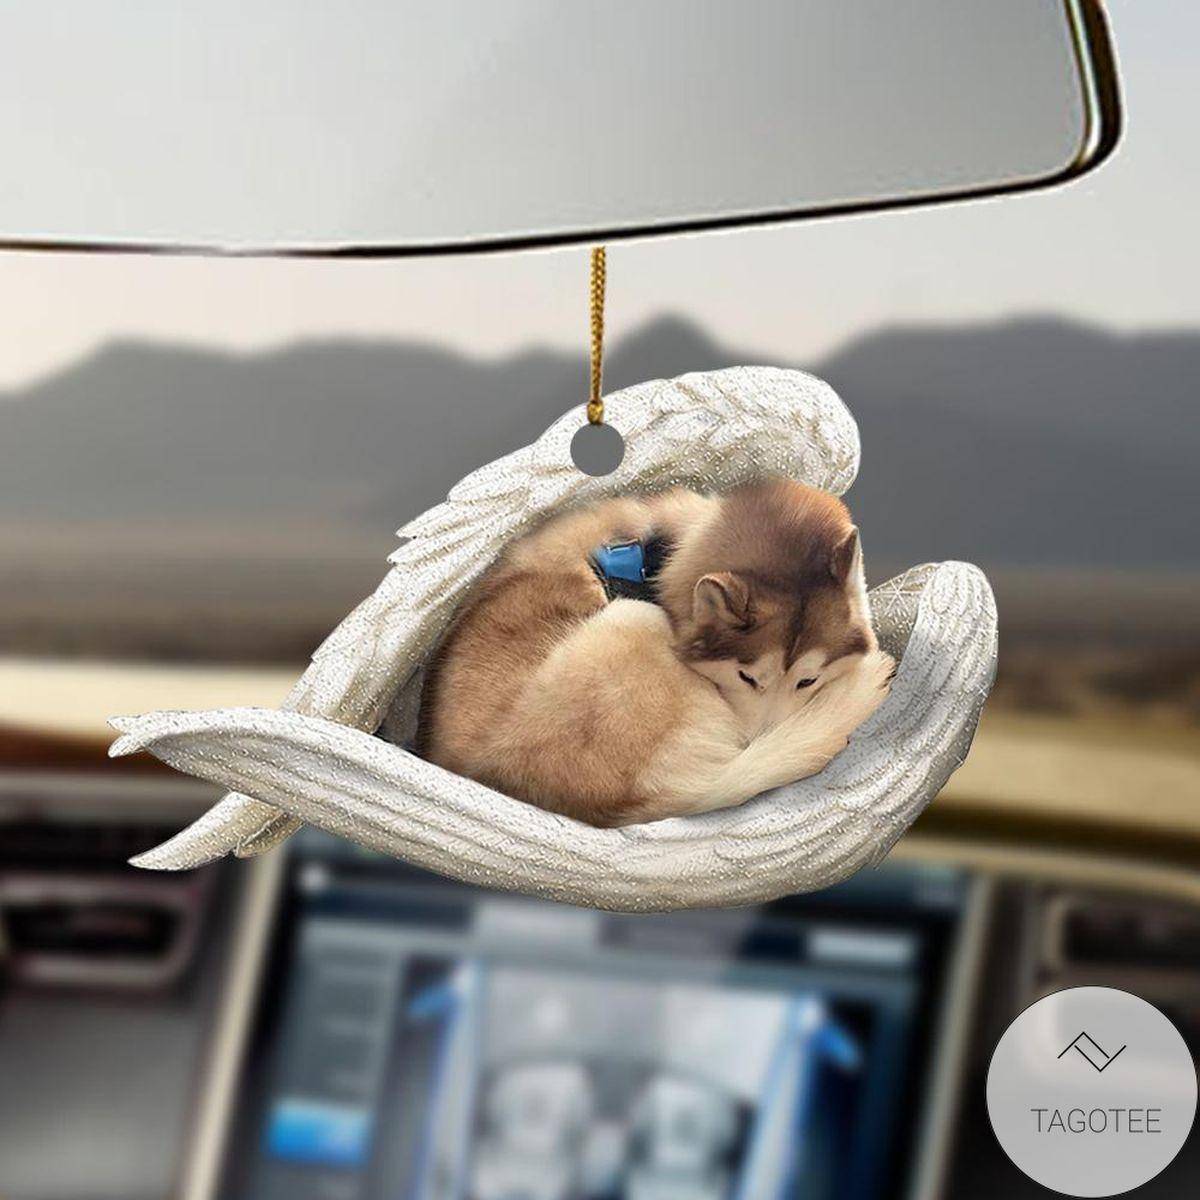 Tan And White Husky Sleeping Angel Car Hanging Sleeping Angel Ornament